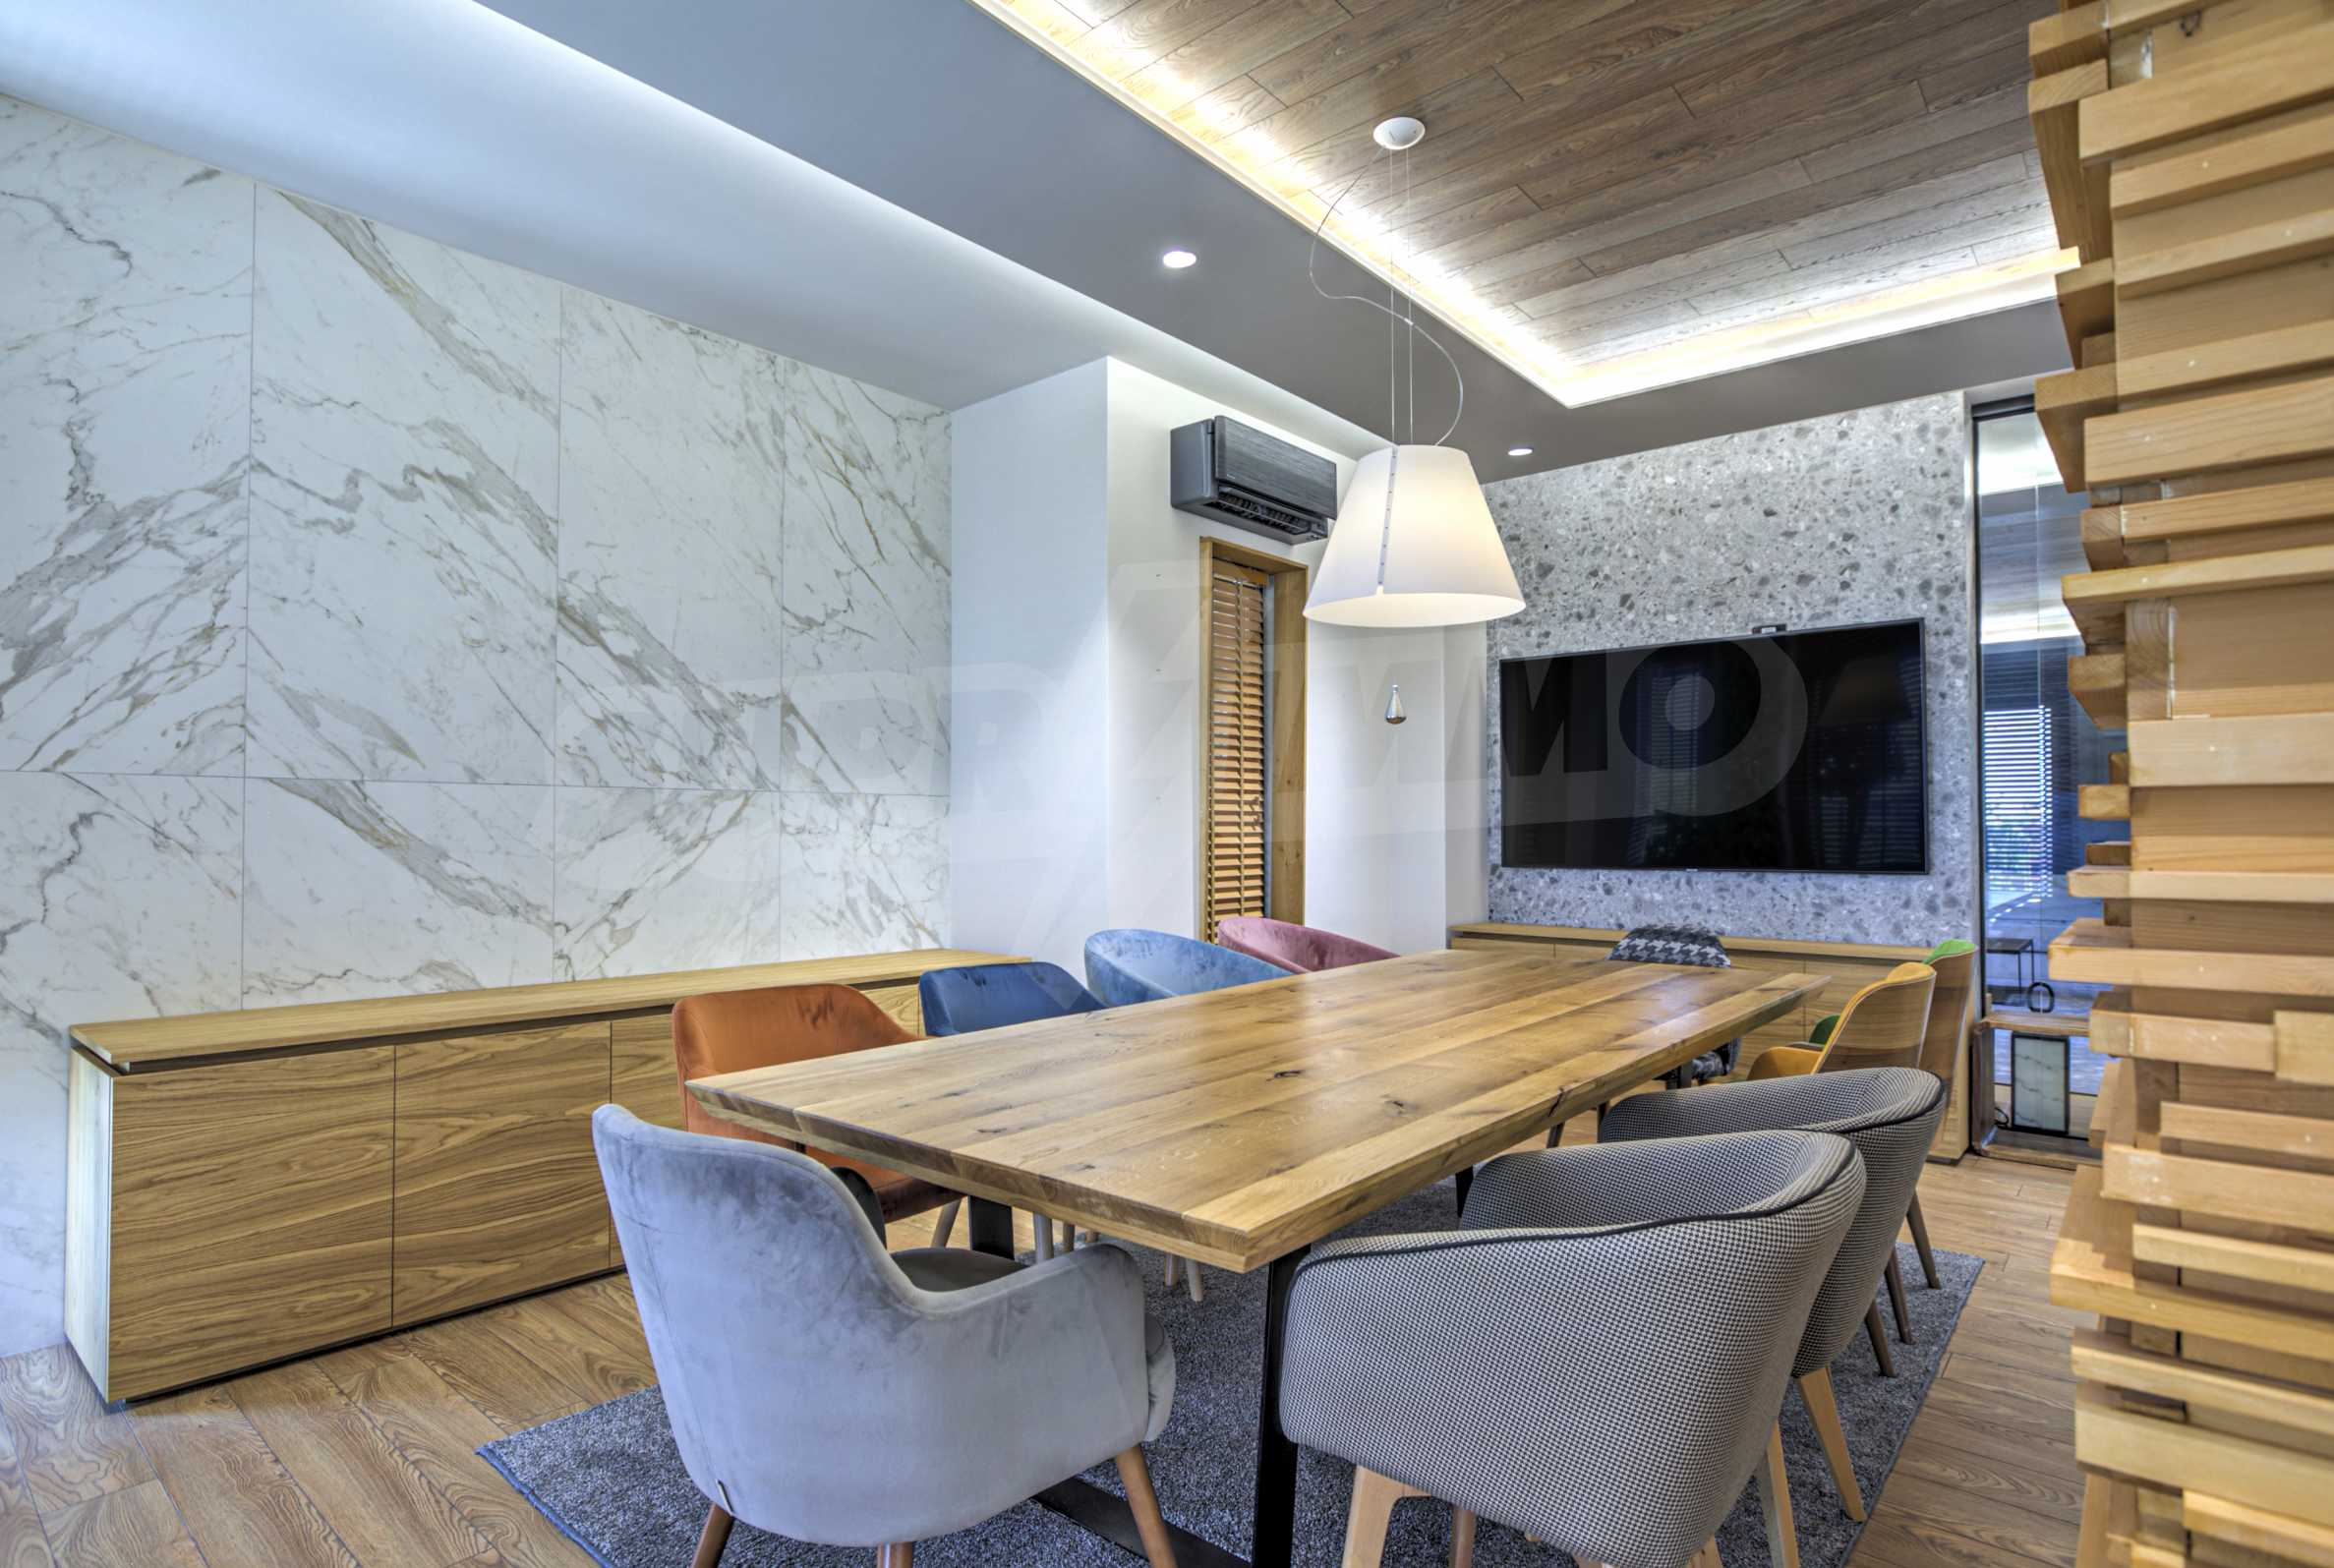 Дизайнерски обзаведен многостаен апартамент 6